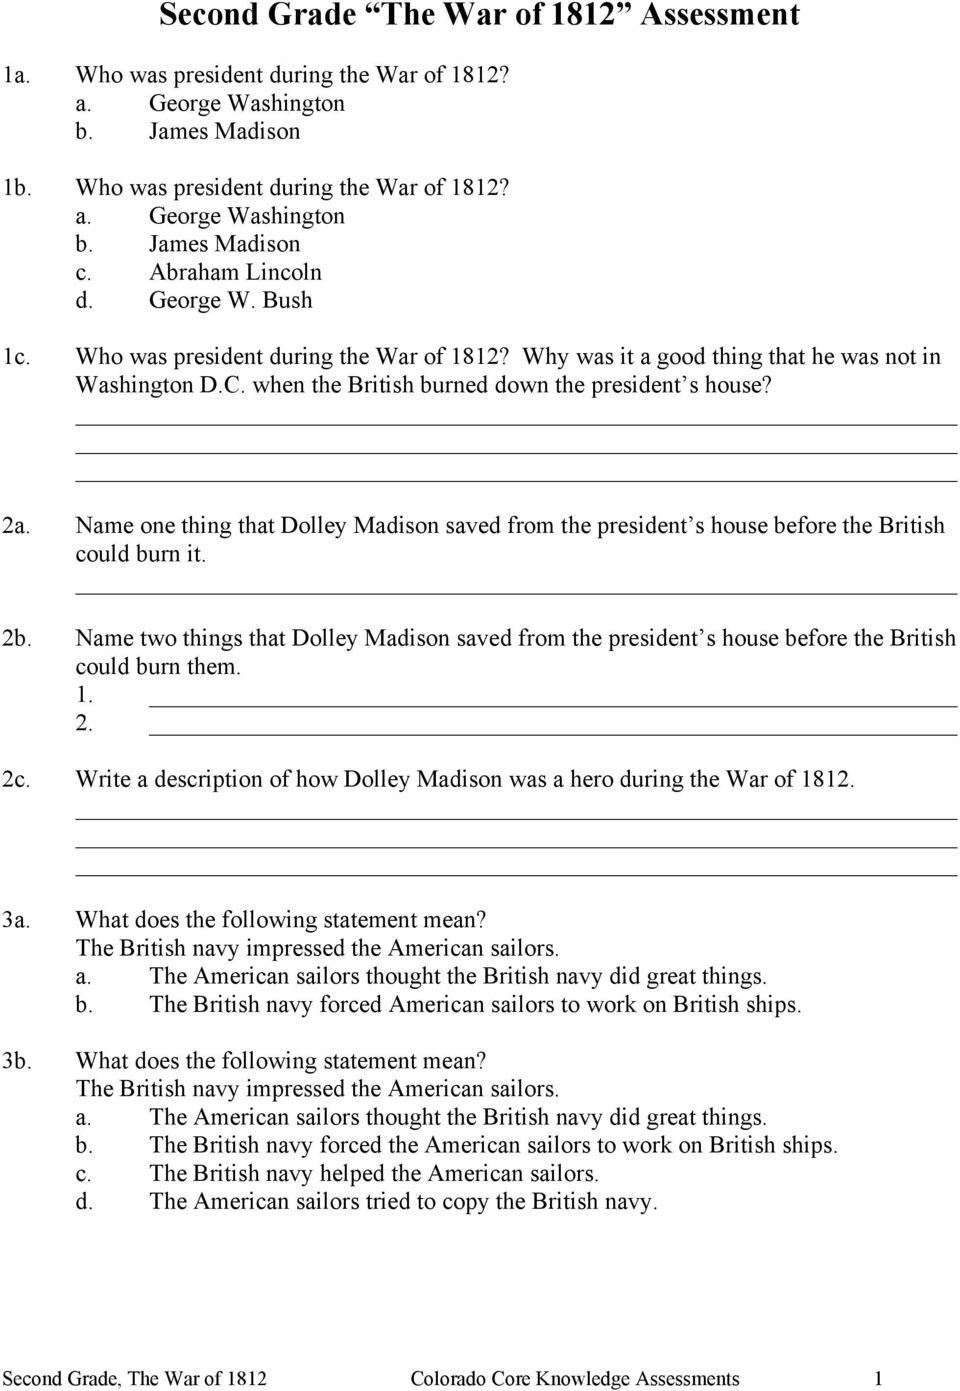 medium resolution of Second Grade The War of 1812 Assessment - PDF Free Download